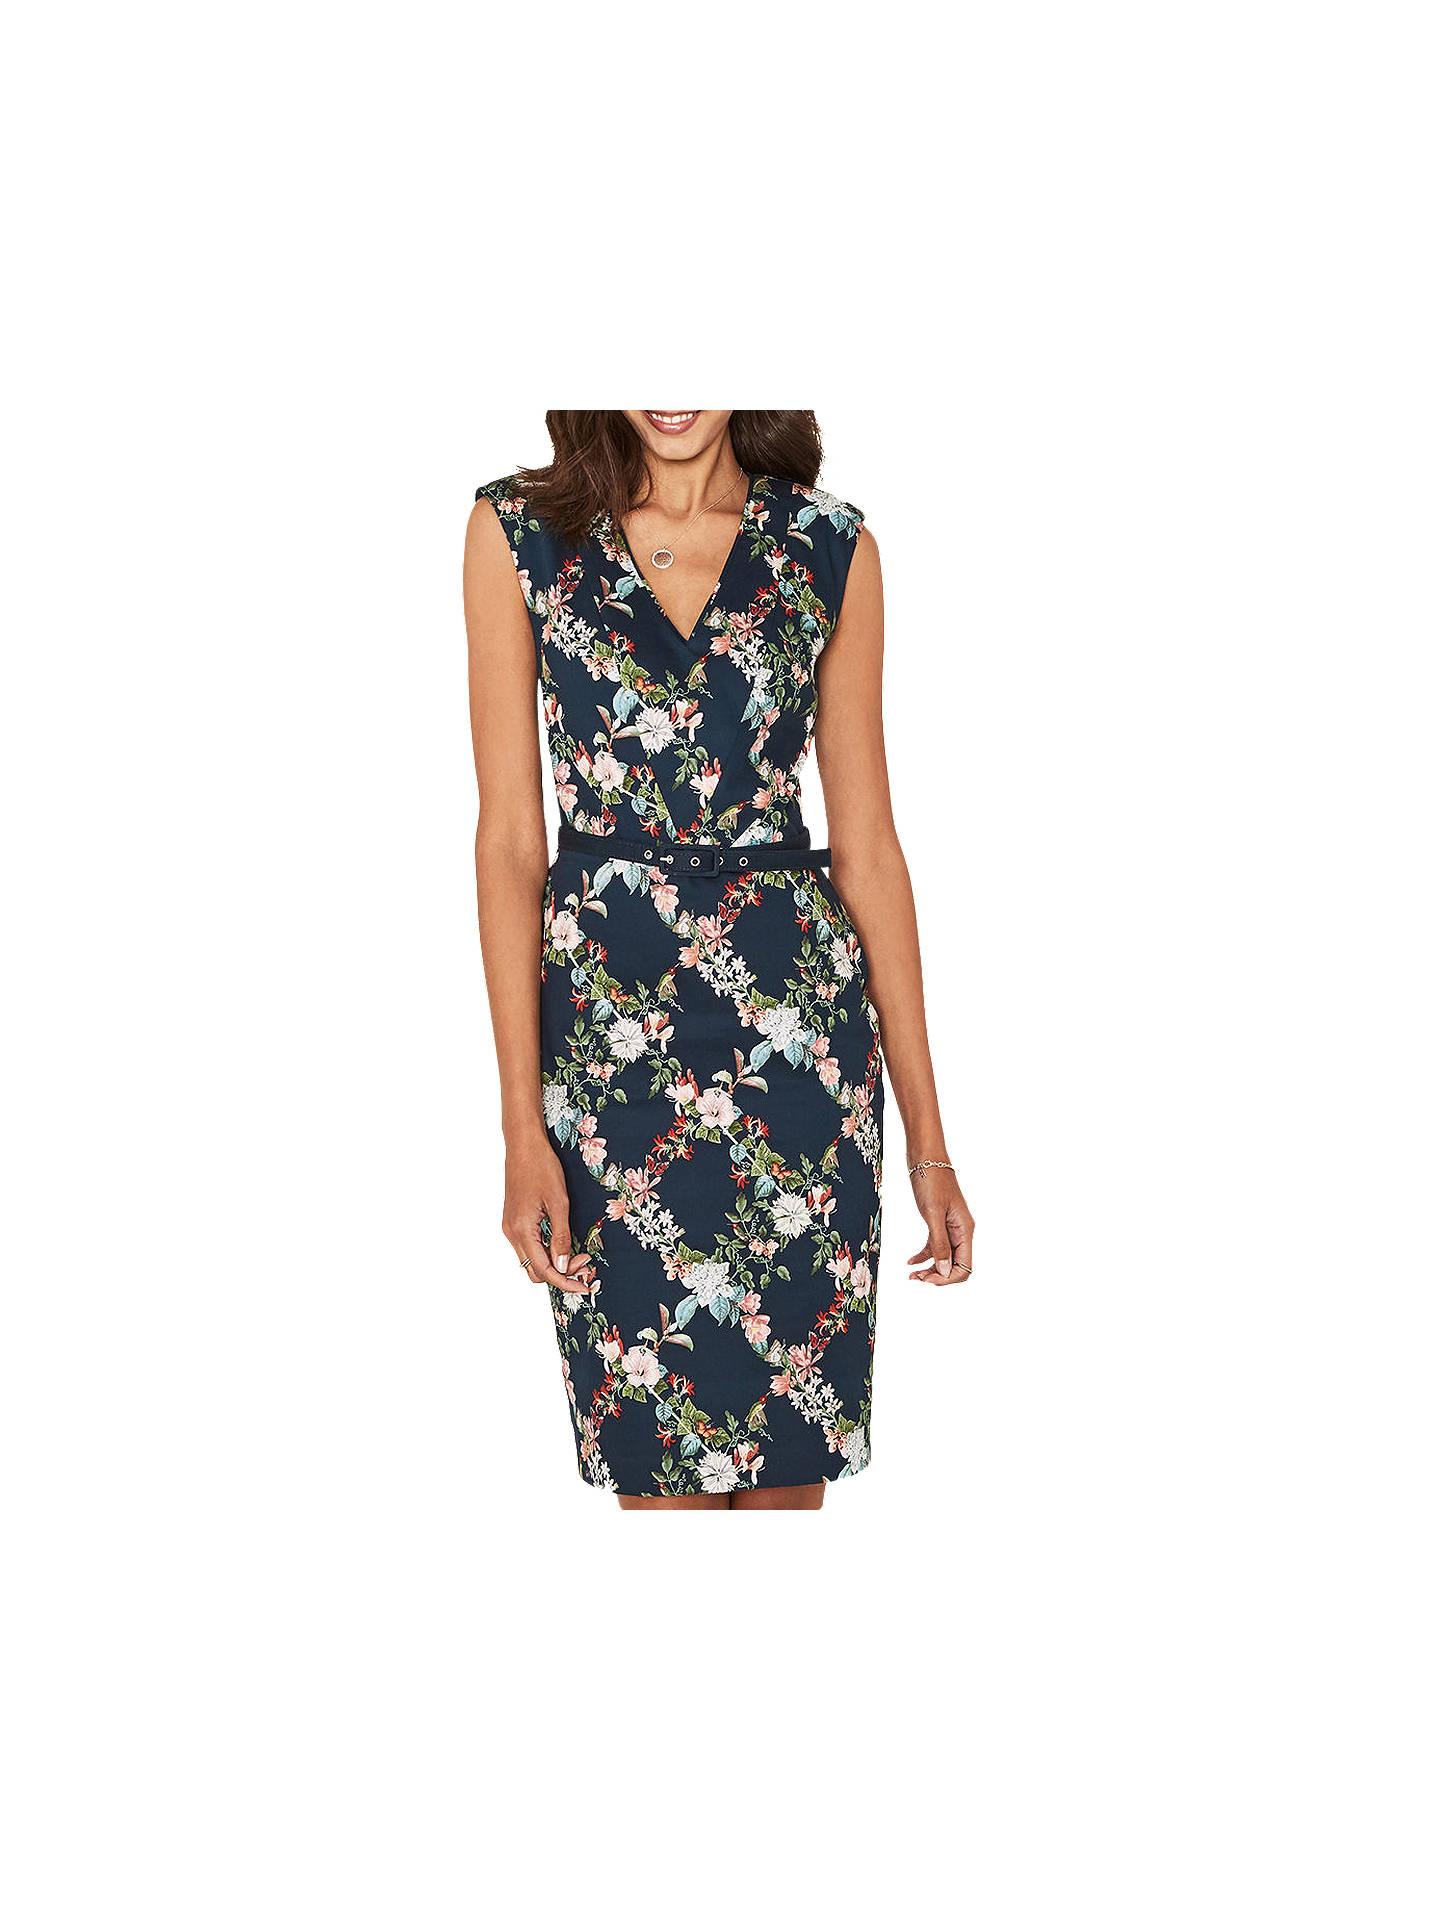 b8ac90ca60cf Buy Oasis Fitzwilliam Floral Pencil Dress, Turquoise, 6 Online at  johnlewis.com ...